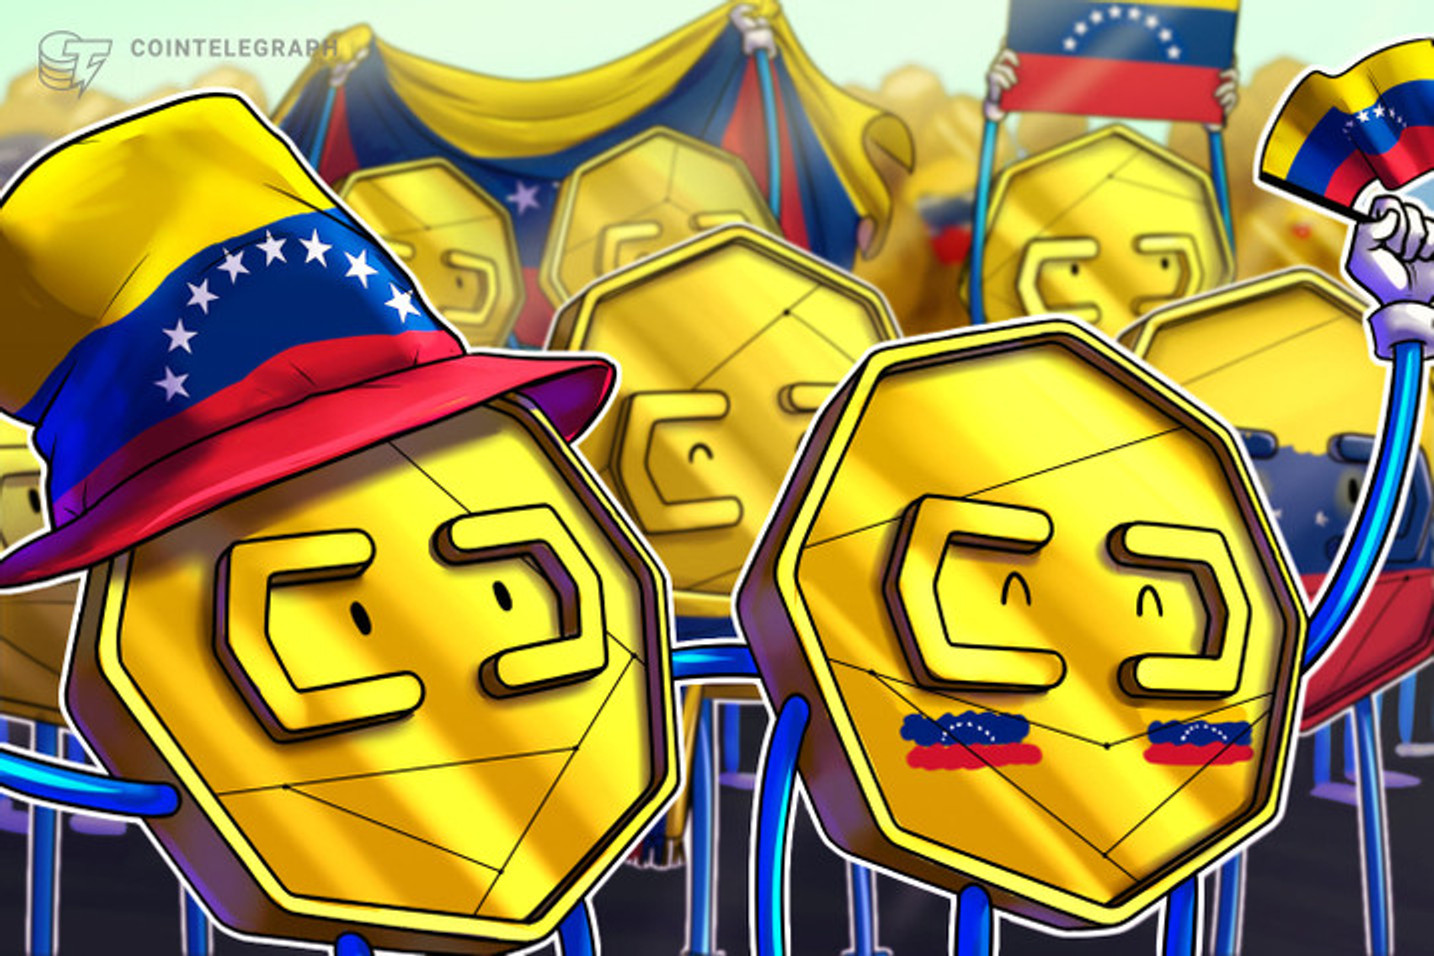 Autoproclamado presidente da Venezuela diz que usou blockchain e criptomoedas para auxílio a médicos durante a pandemia